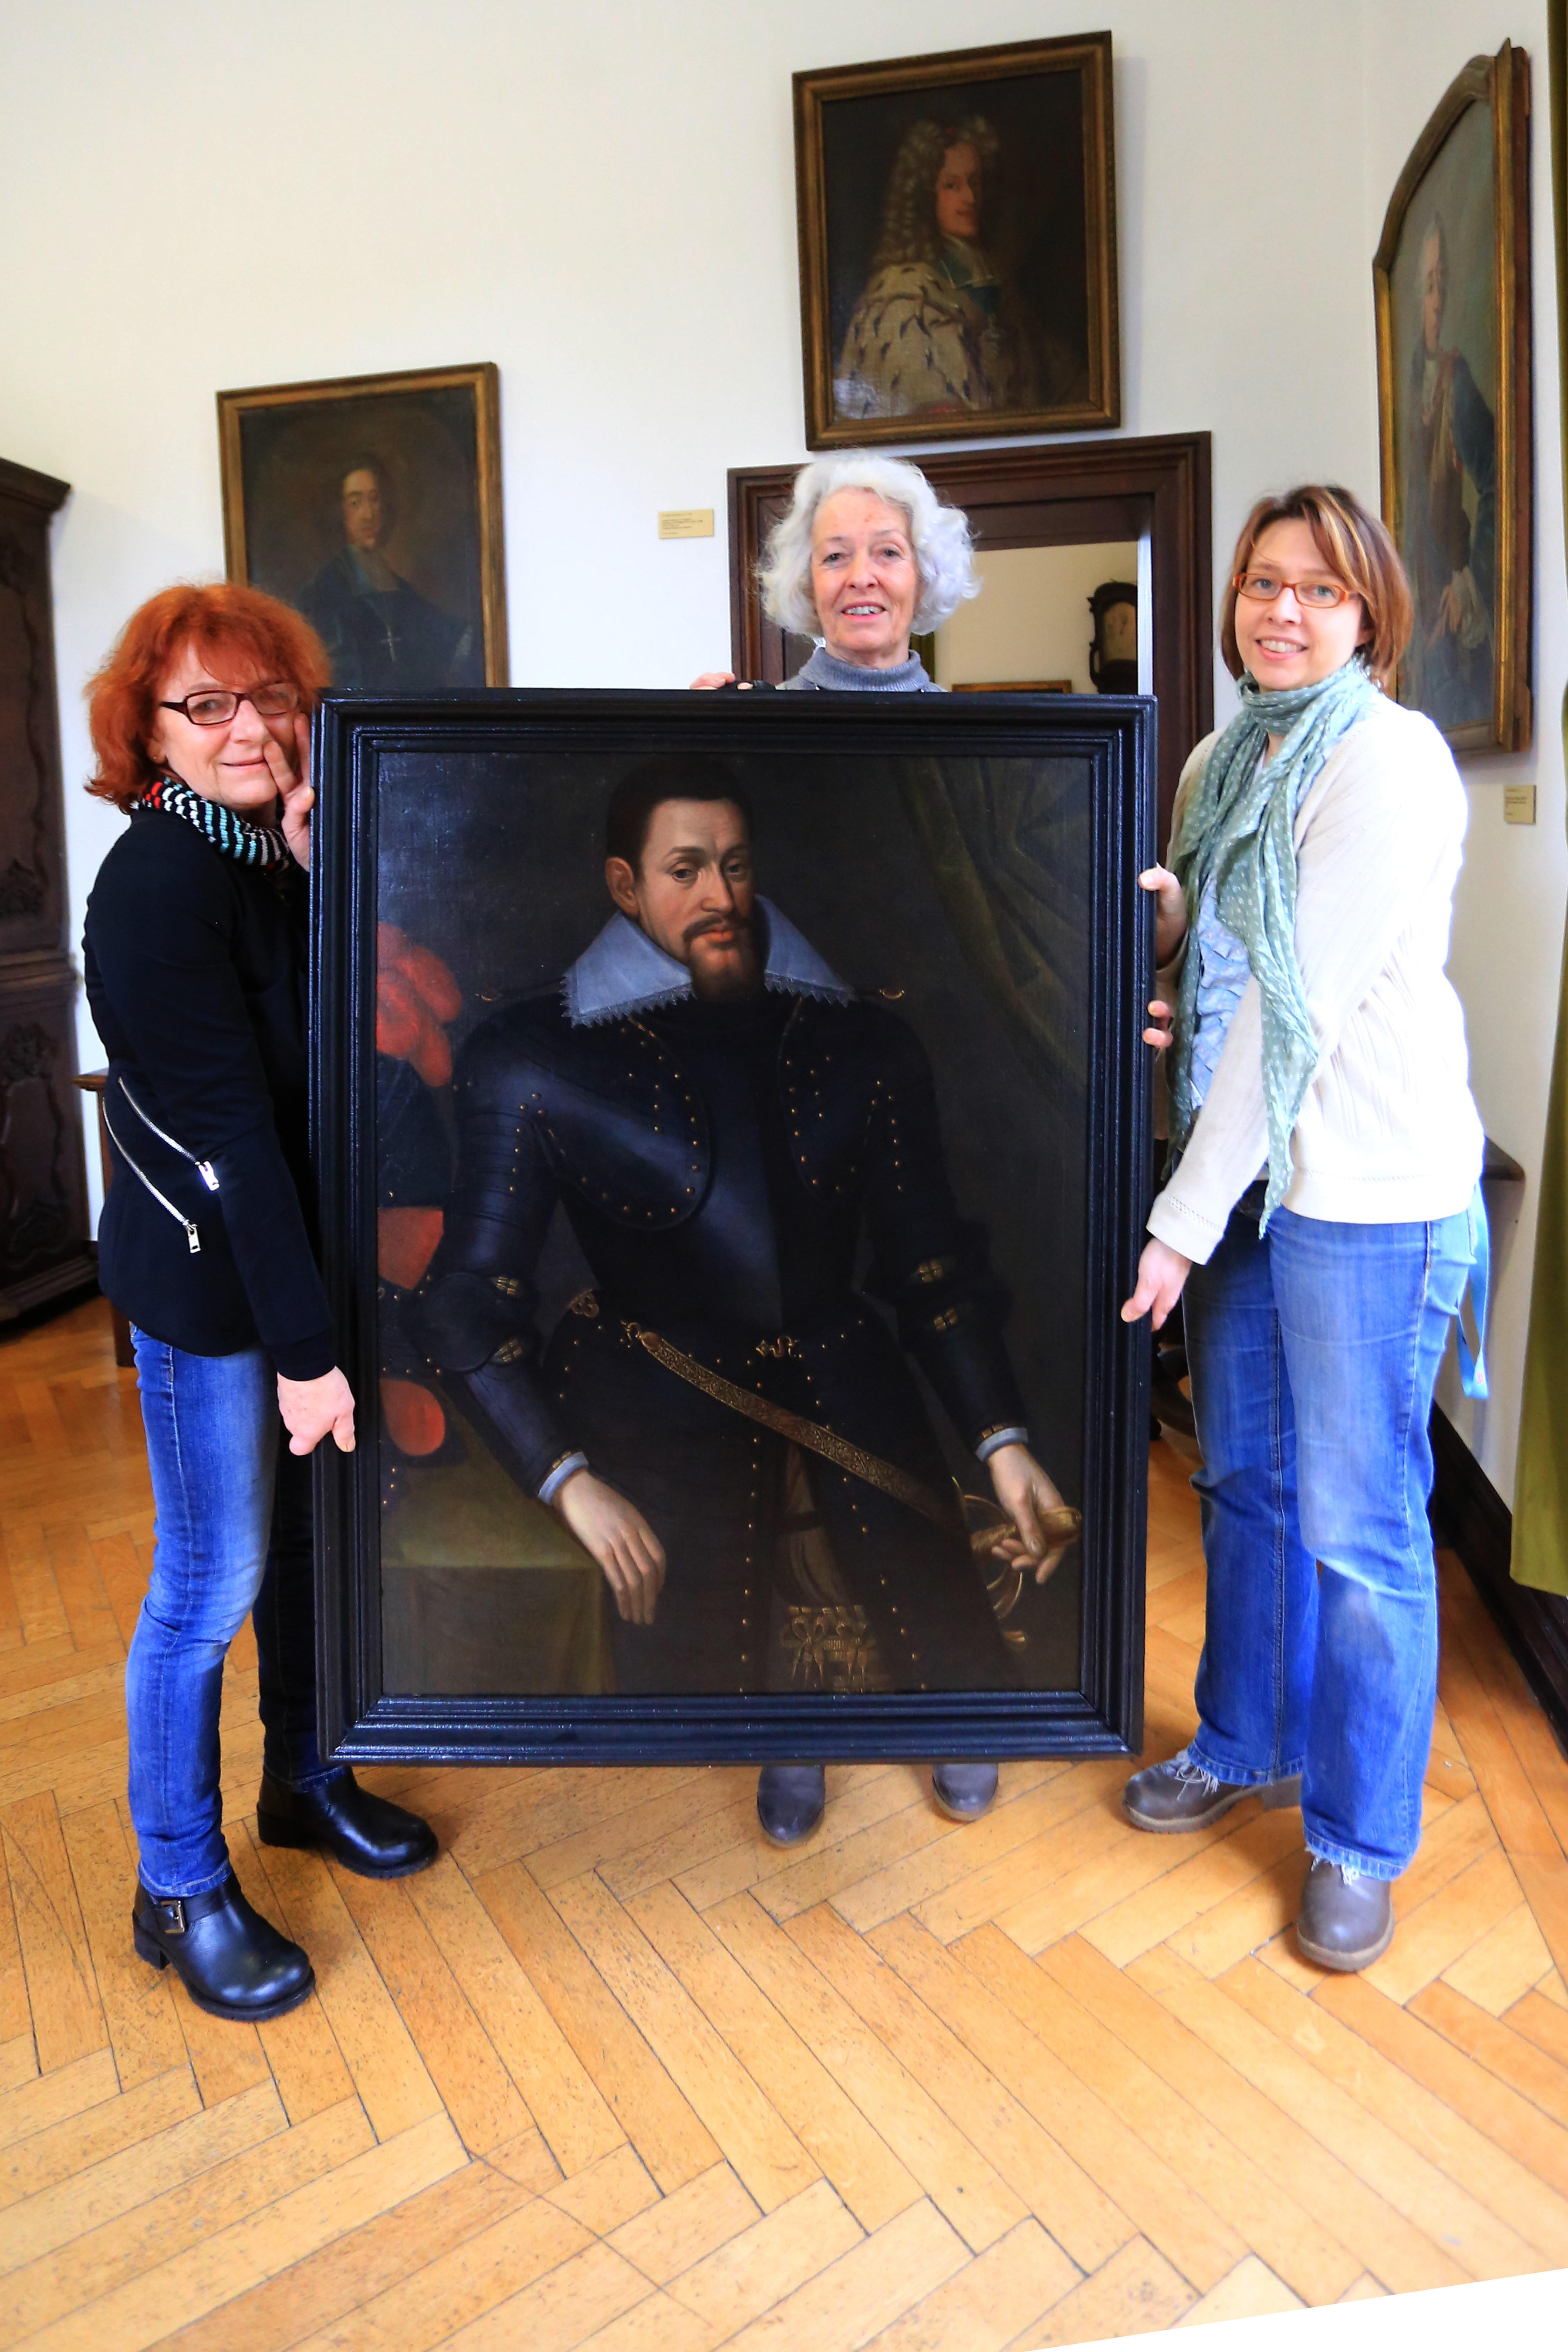 Portrait-Restaurierung im Jagdschloss beendet (Foto: Stadt Krefeld)